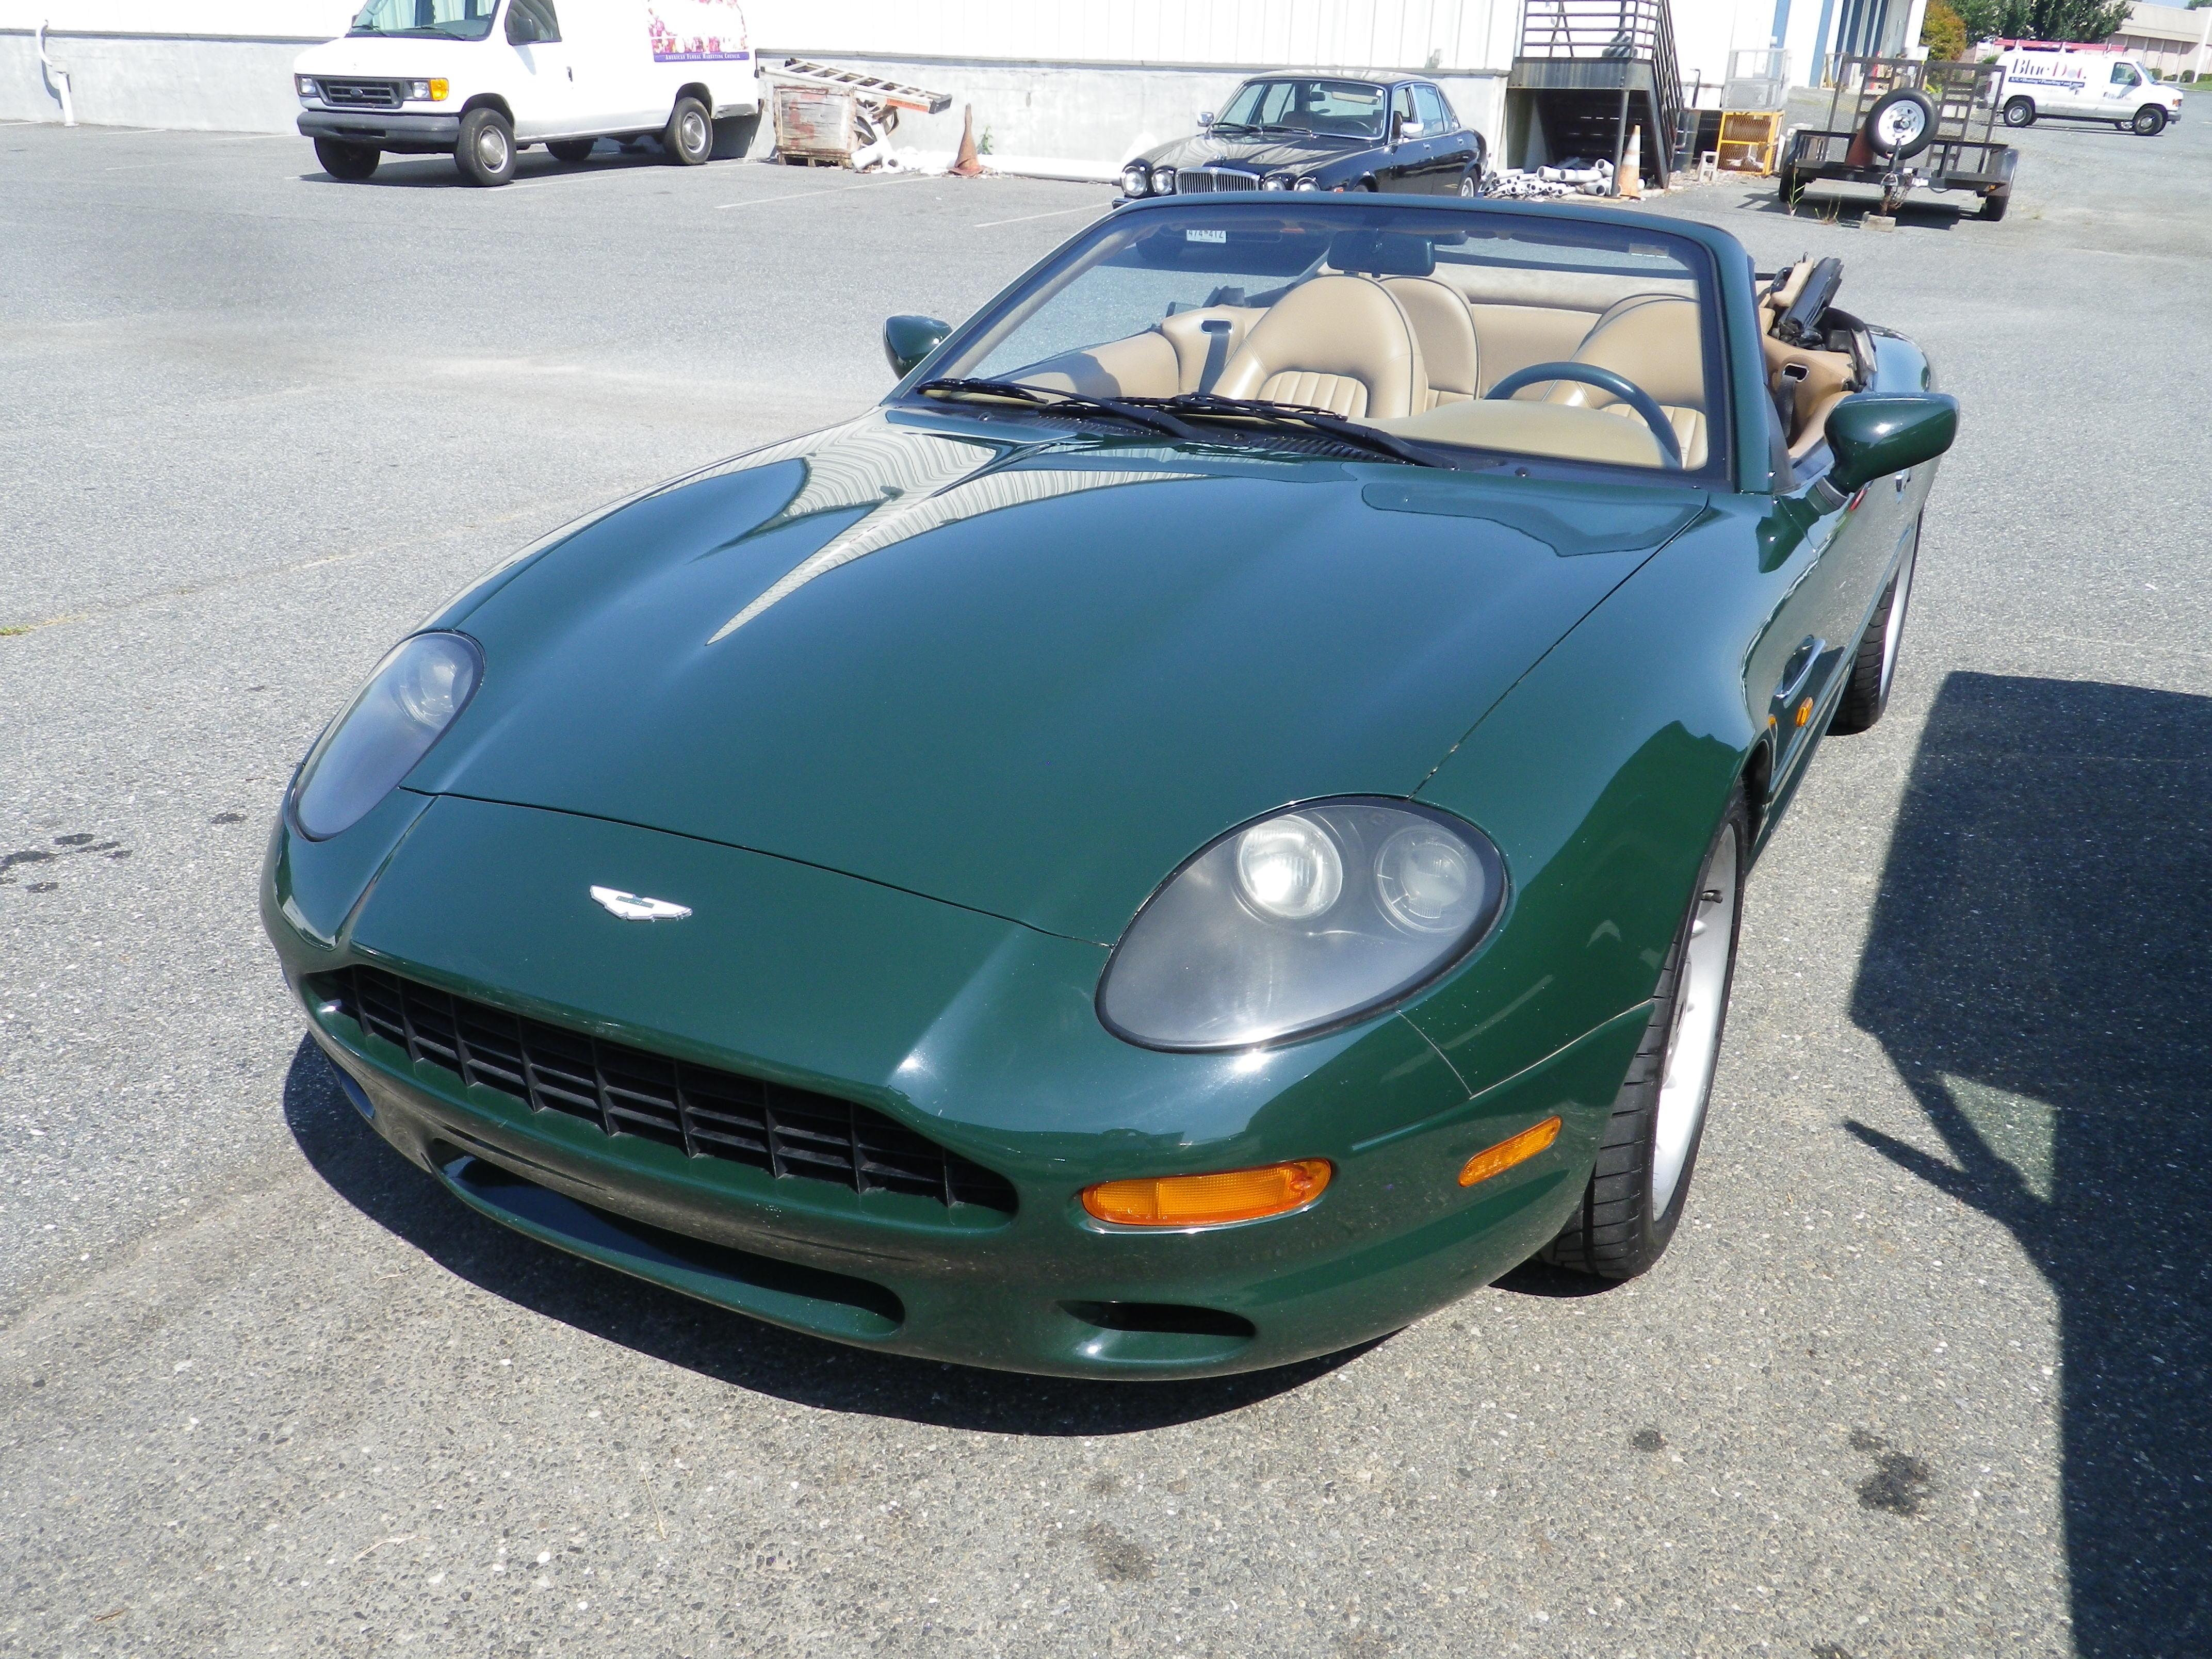 Aston Martin DB For Sale Raspis British Imports - Aston martin db 7 for sale